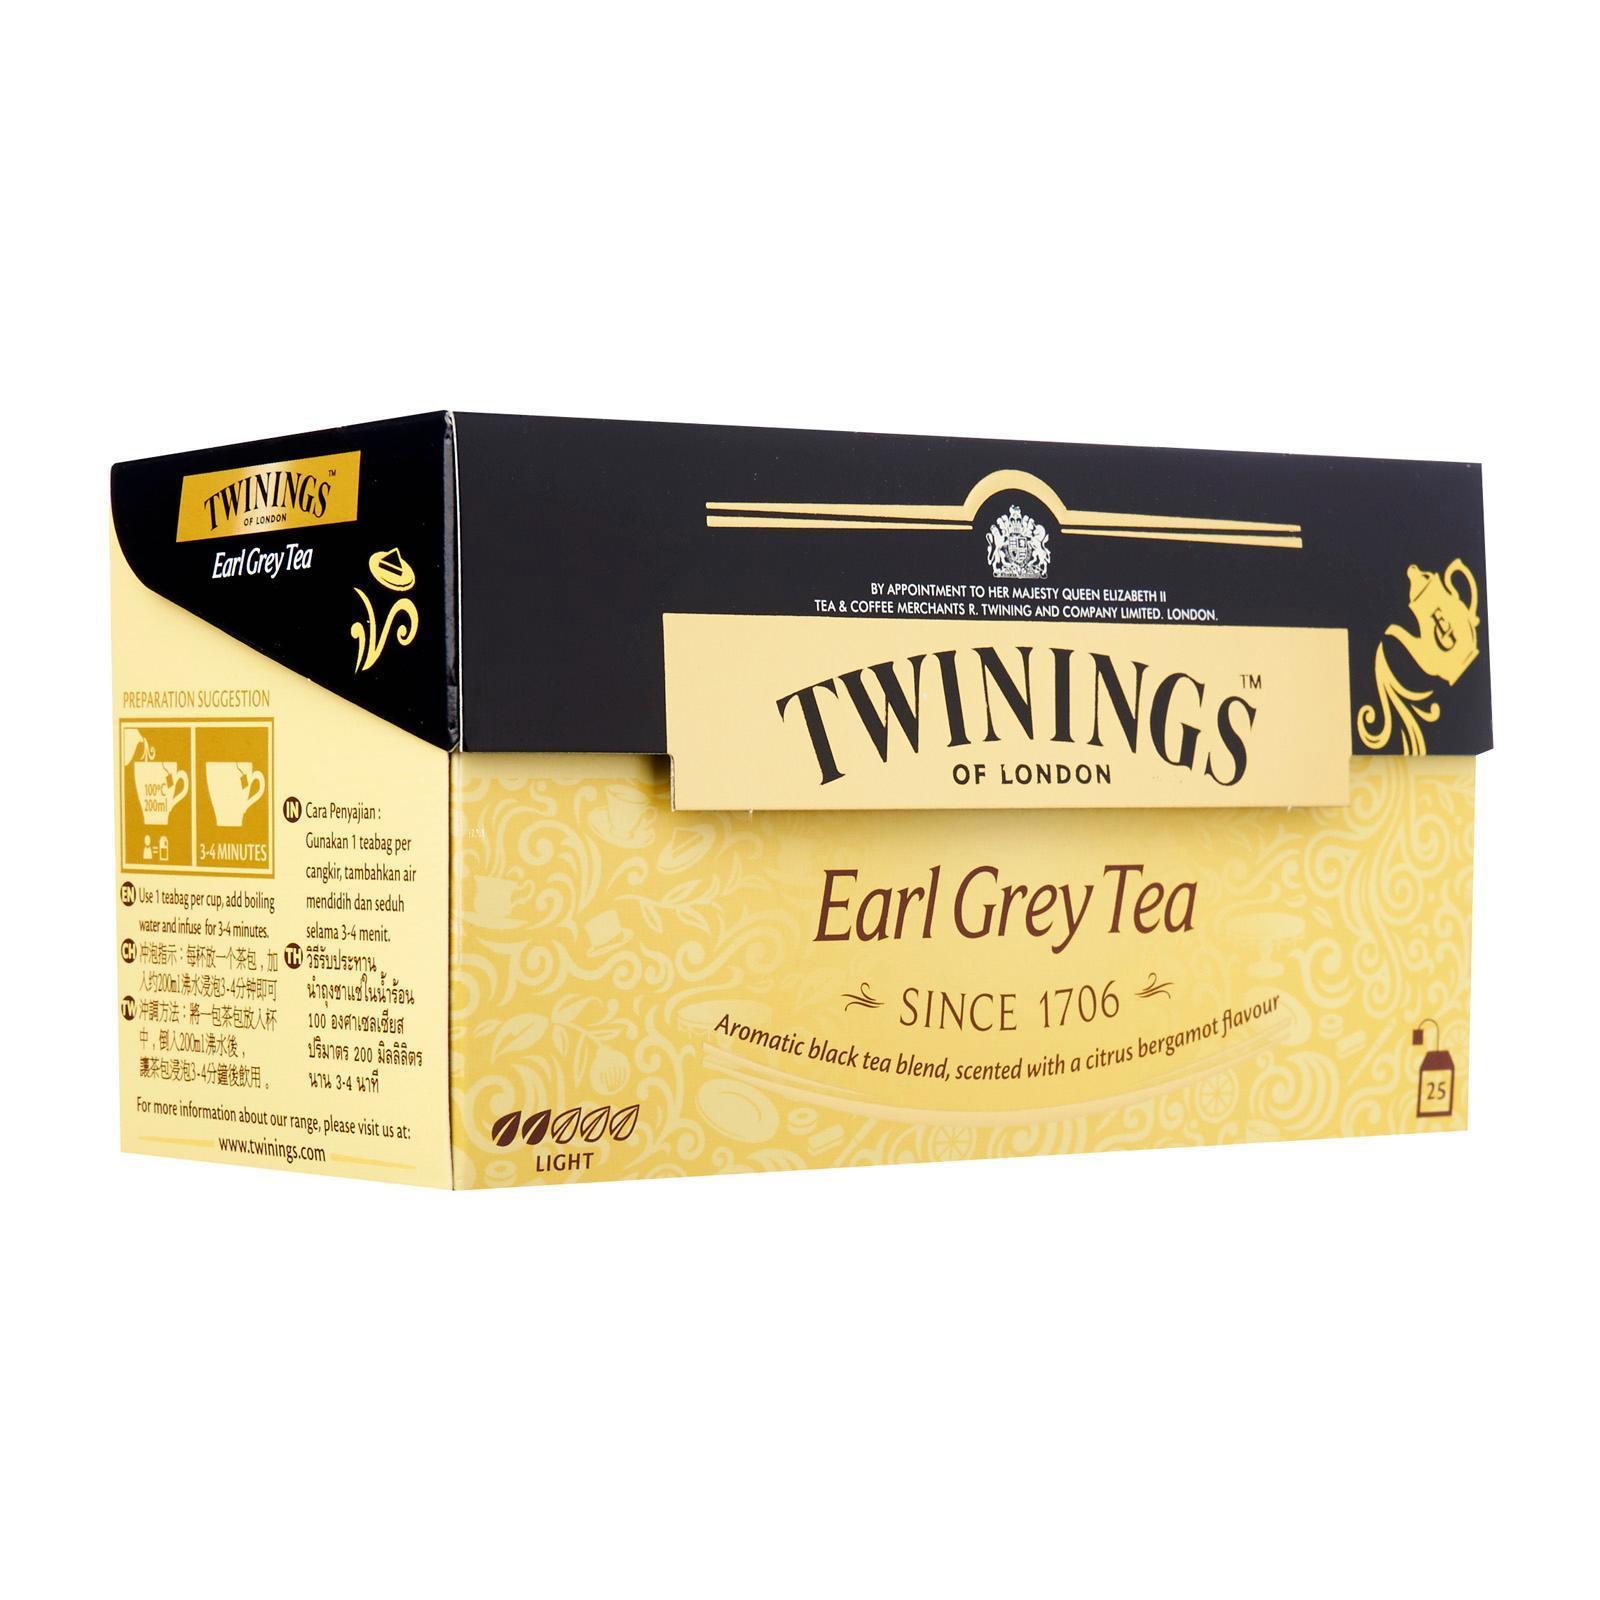 Twinings Earl Grey Tea 25's